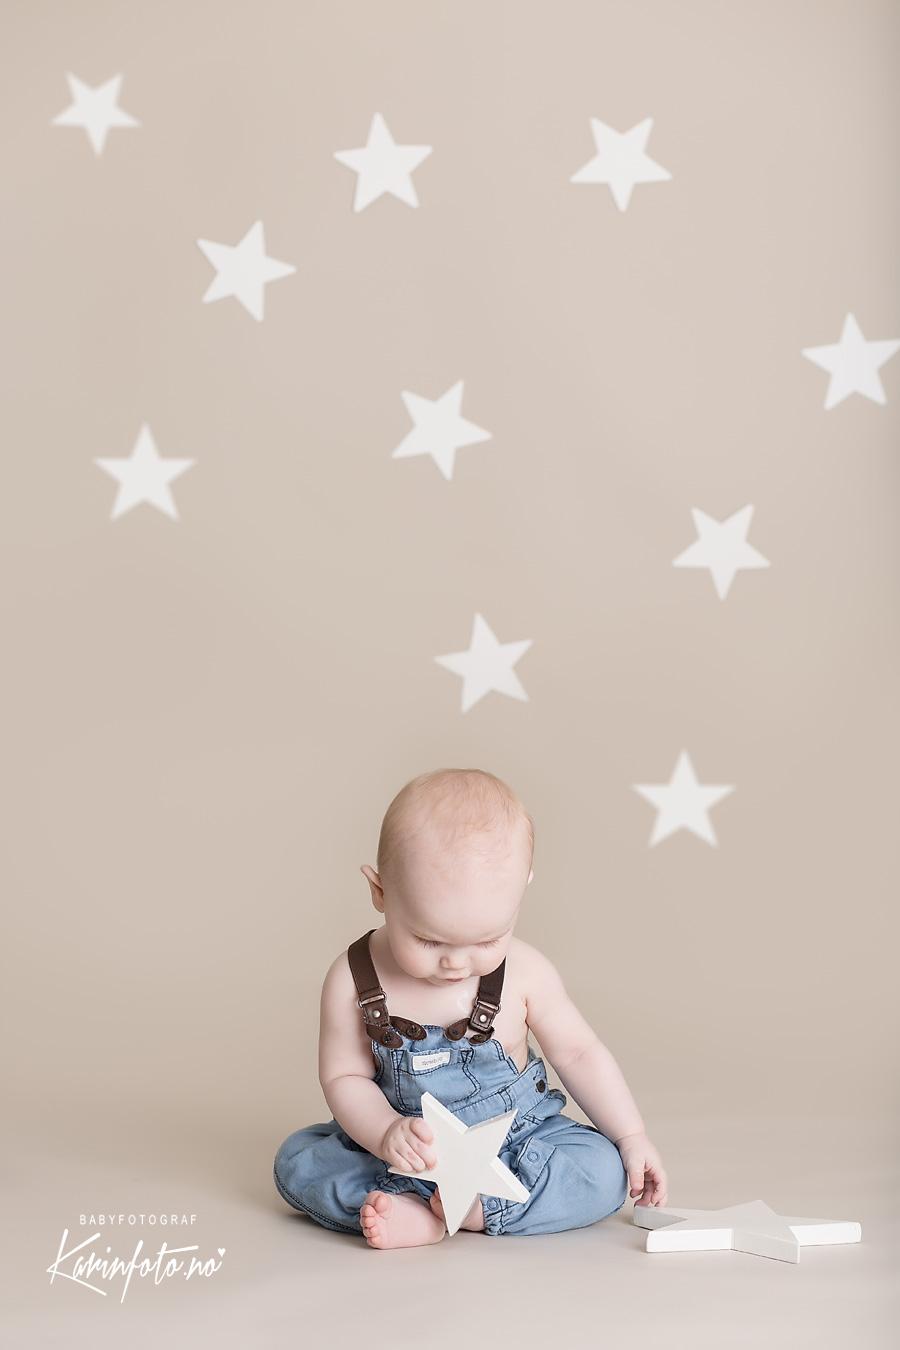 Baby 7 mmd,babyfotografering,studio,babyfotograf Karin Pedersen,Sarpsborg,Østfold,